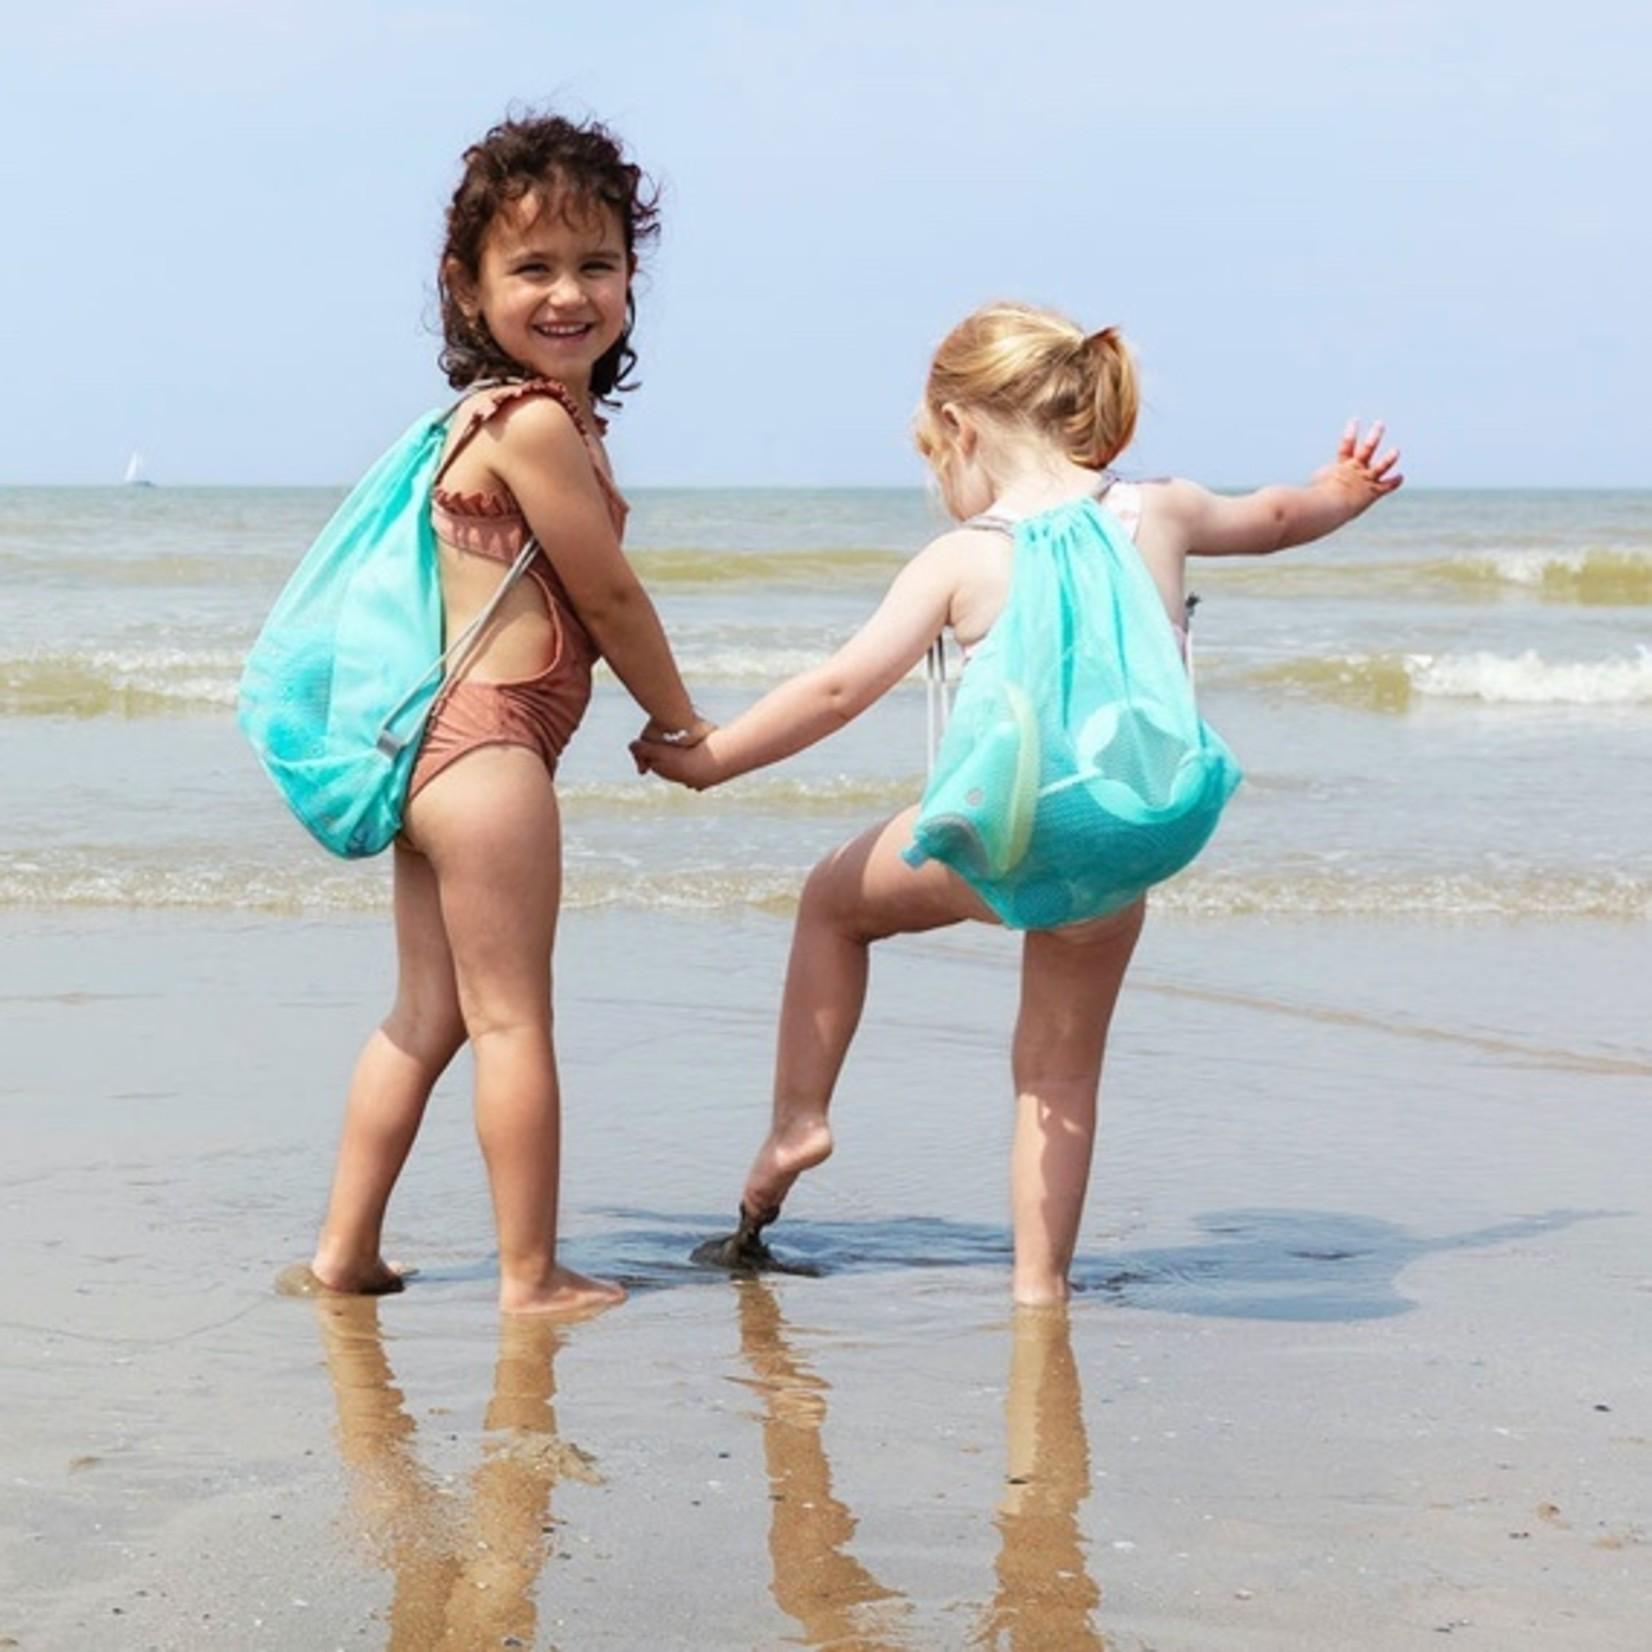 Beach Set : 1 Ballo + 1 Cuppi + 1 Shaper + 1 mesh bag